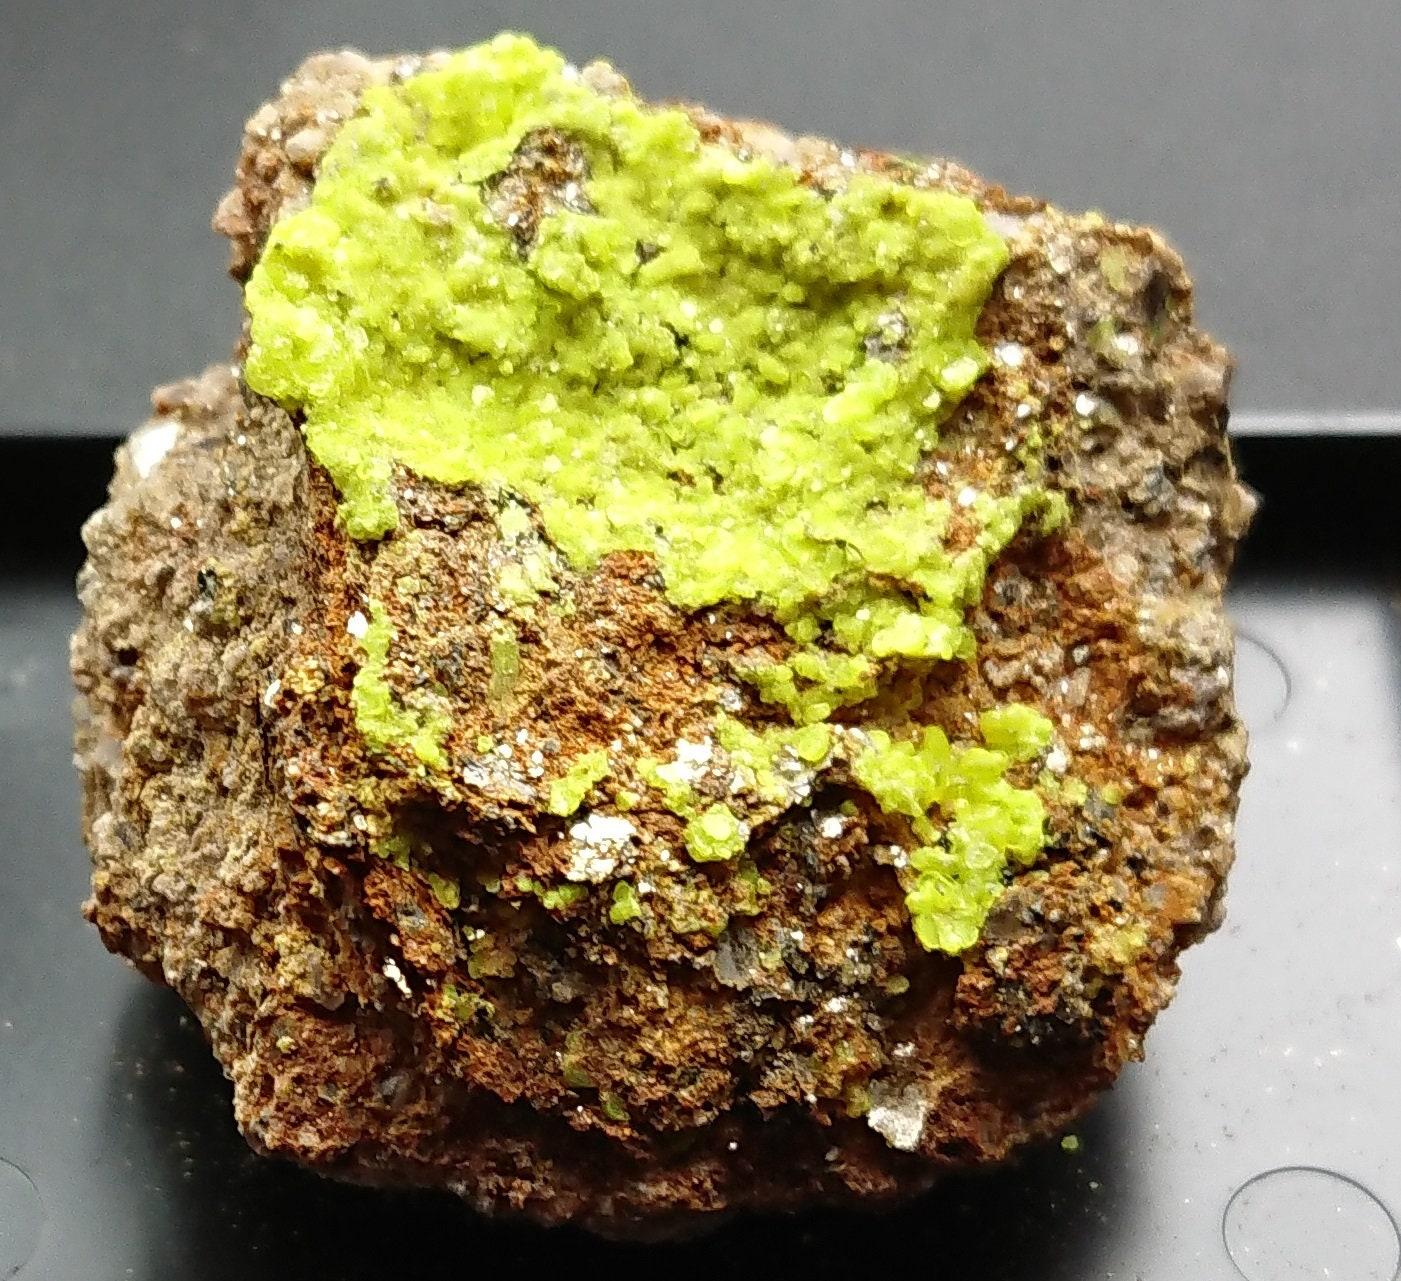 Rare - Autunite 35 grammes - Fluorescent Fluorescent - - Margnac, France c18271